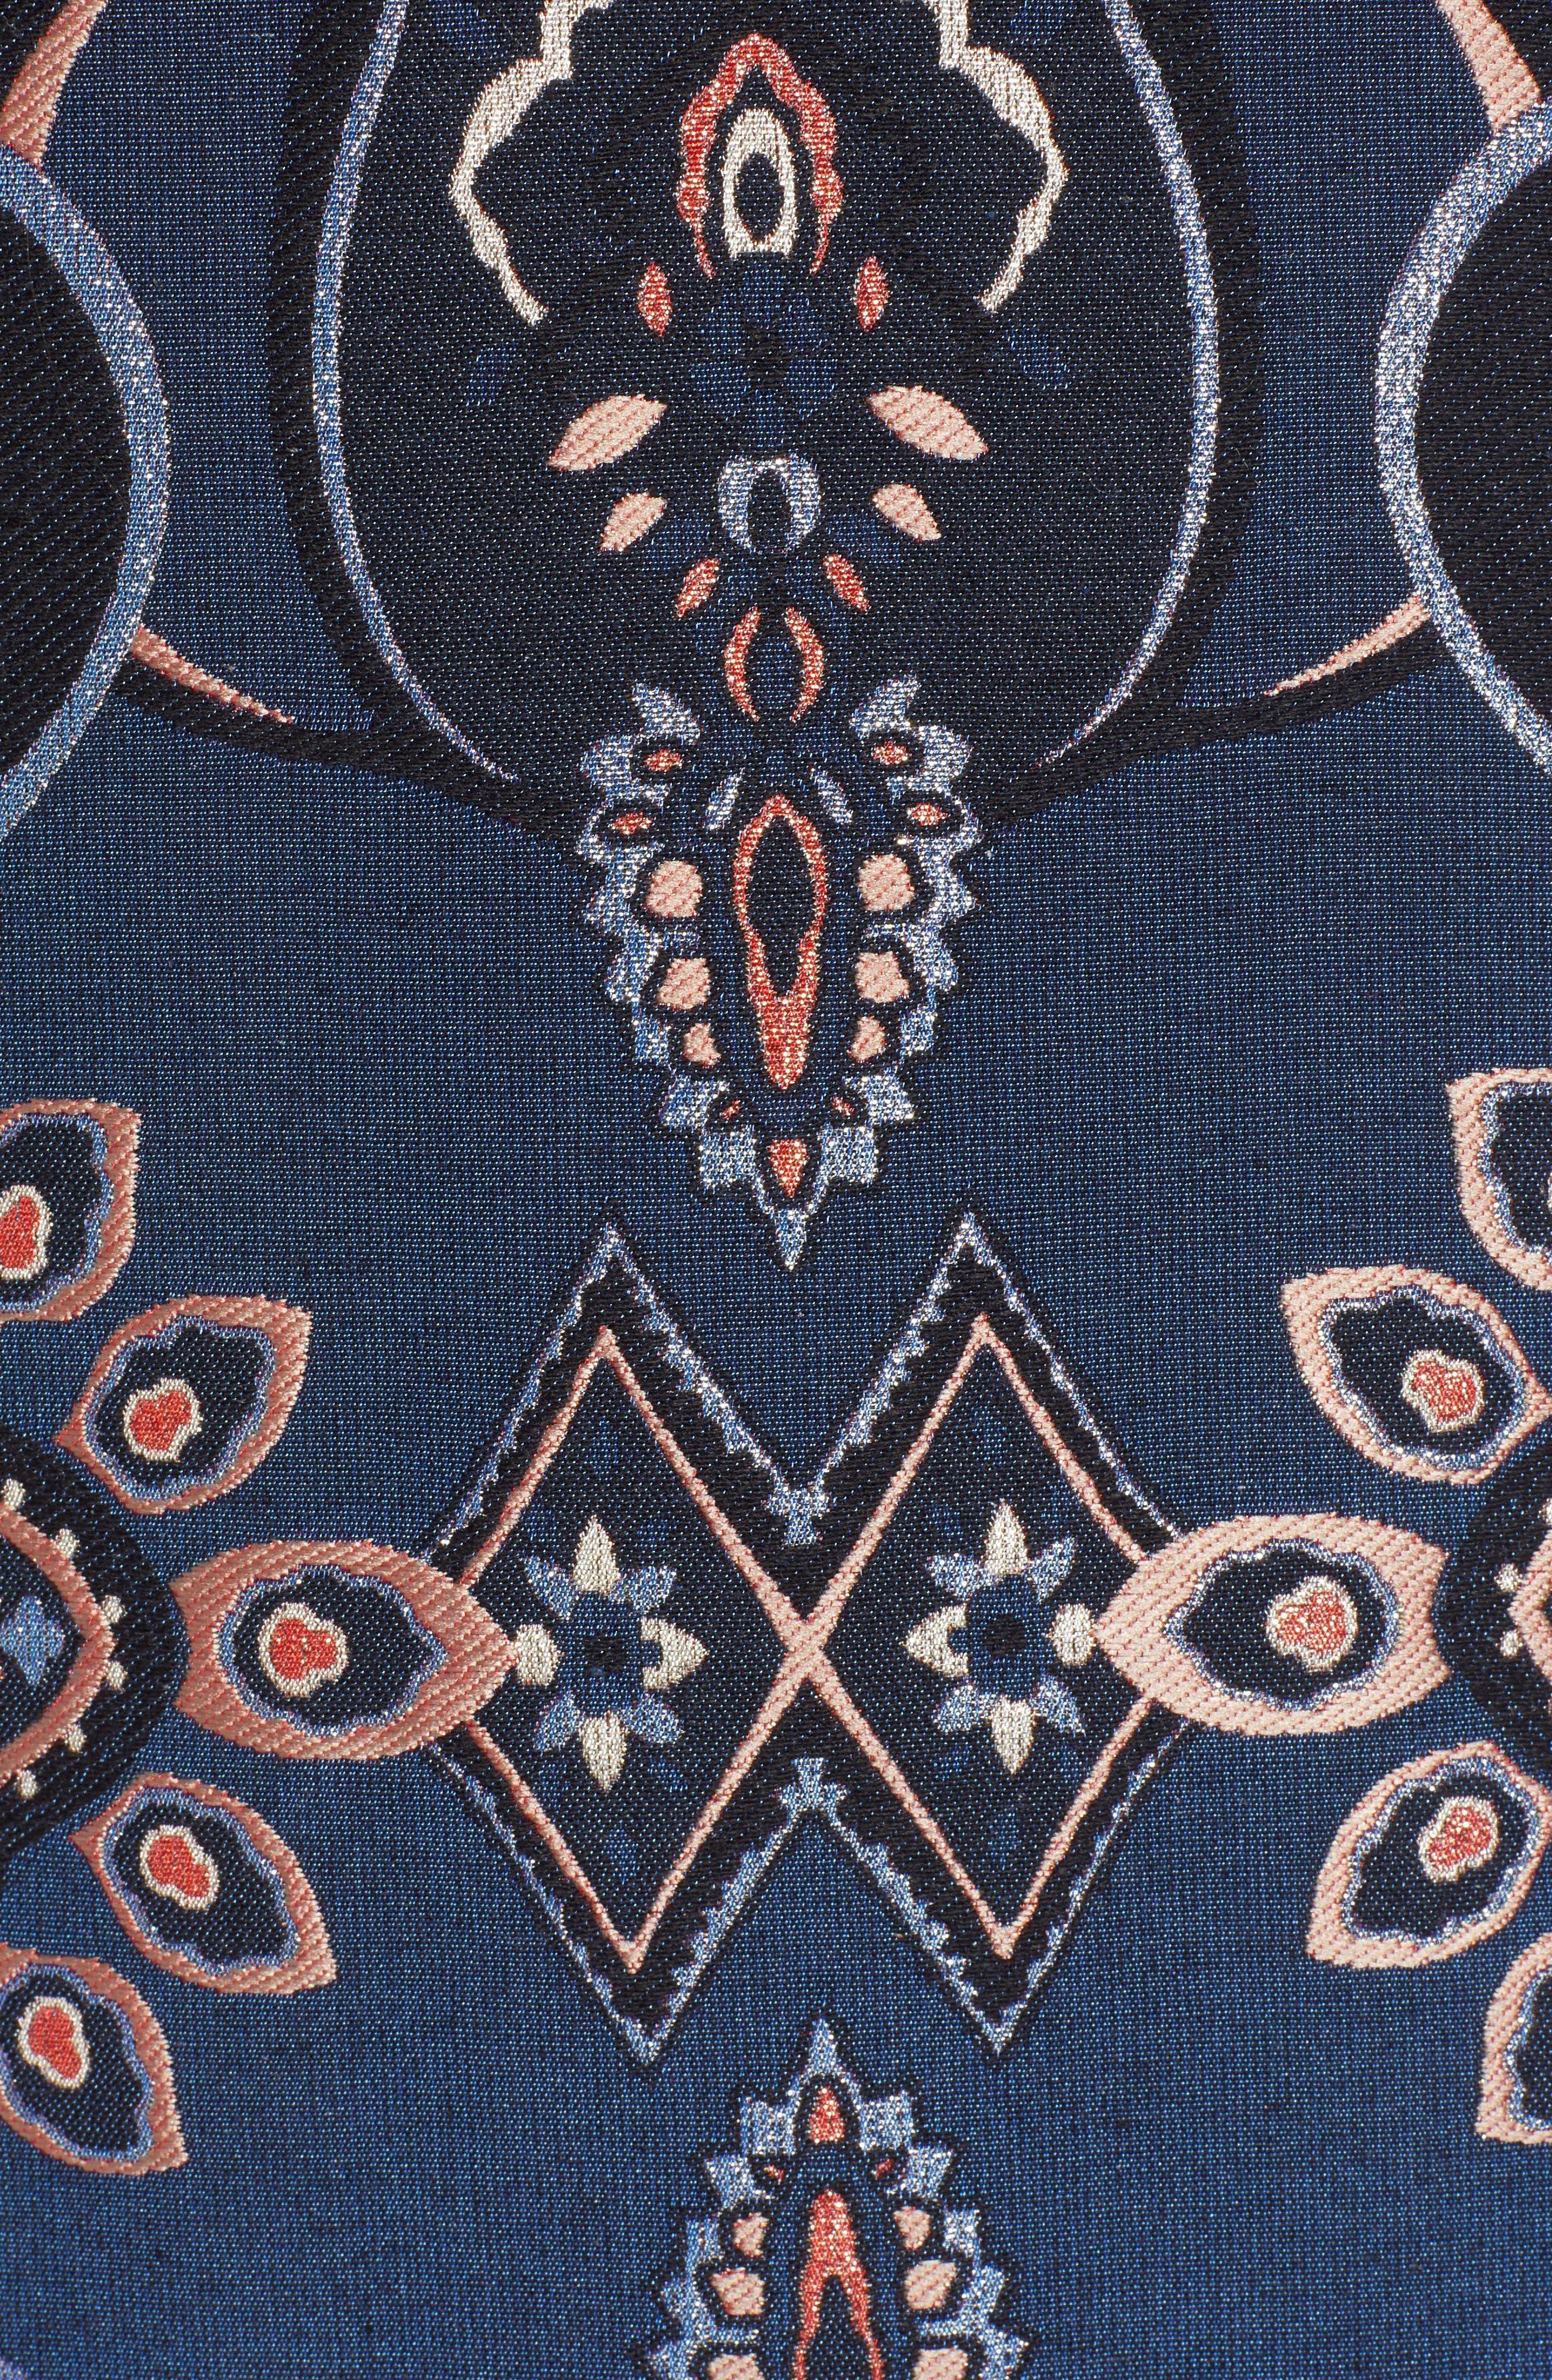 Brocade Shift Dress,                             Alternate thumbnail 6, color,                             NAVY MULTI BROCADE